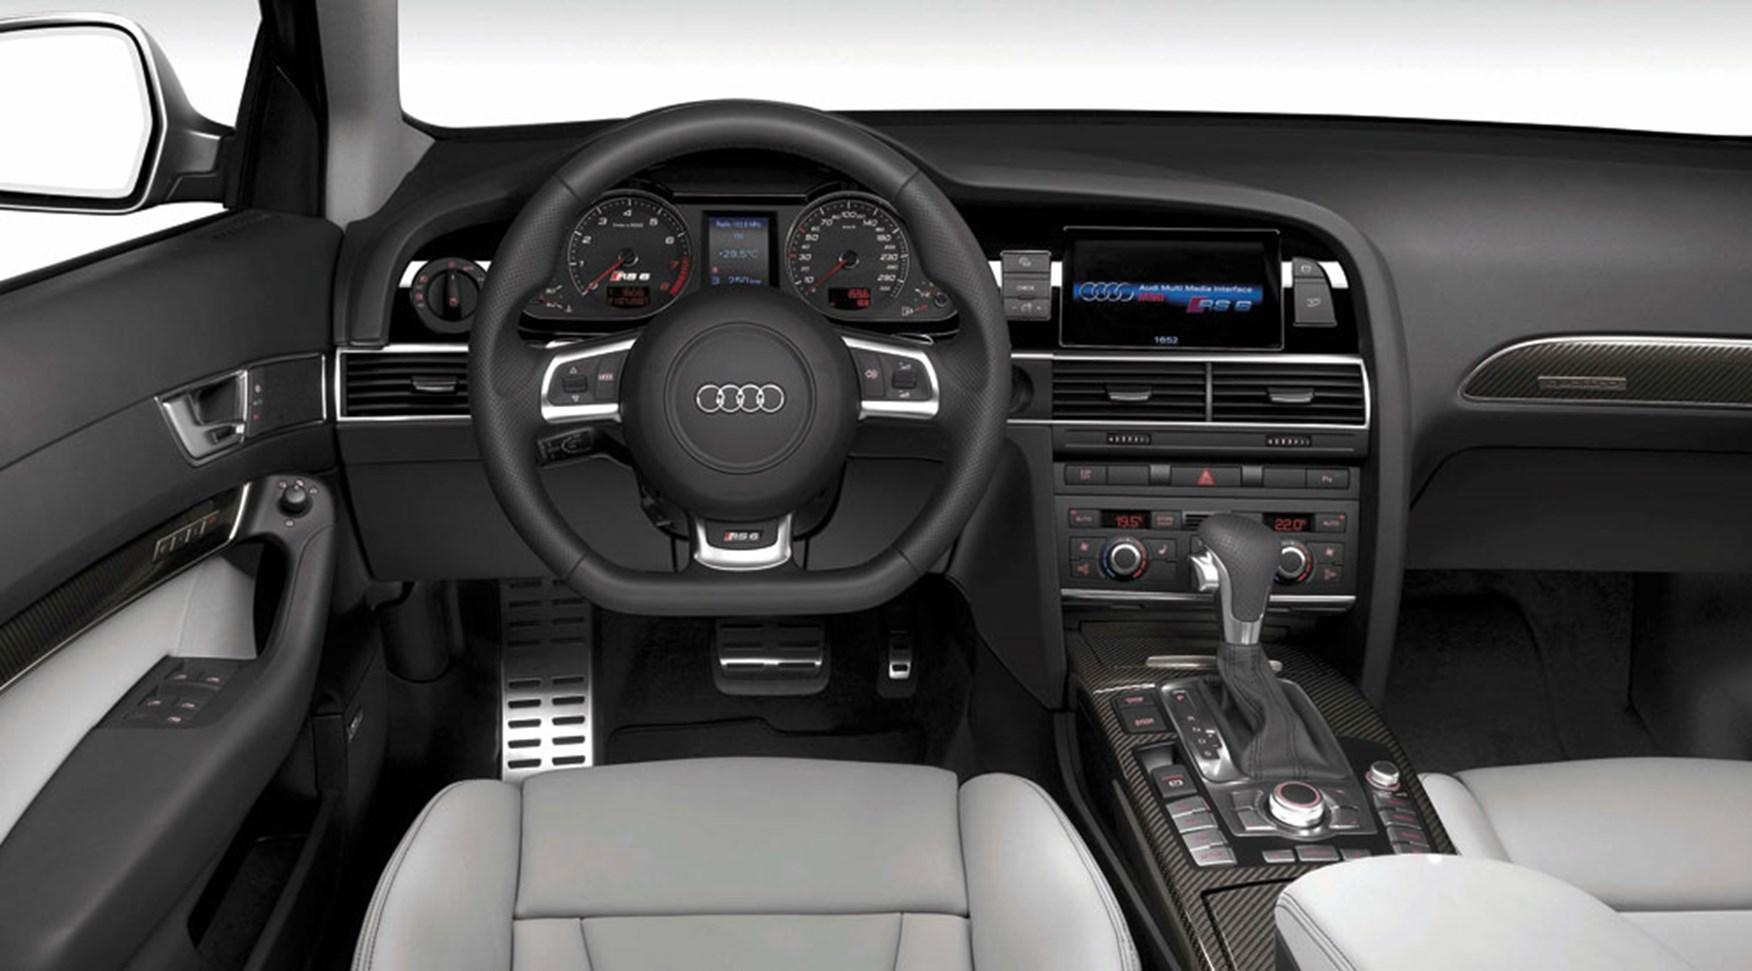 Audi Rs6 Avant 2008 Review By Car Magazine